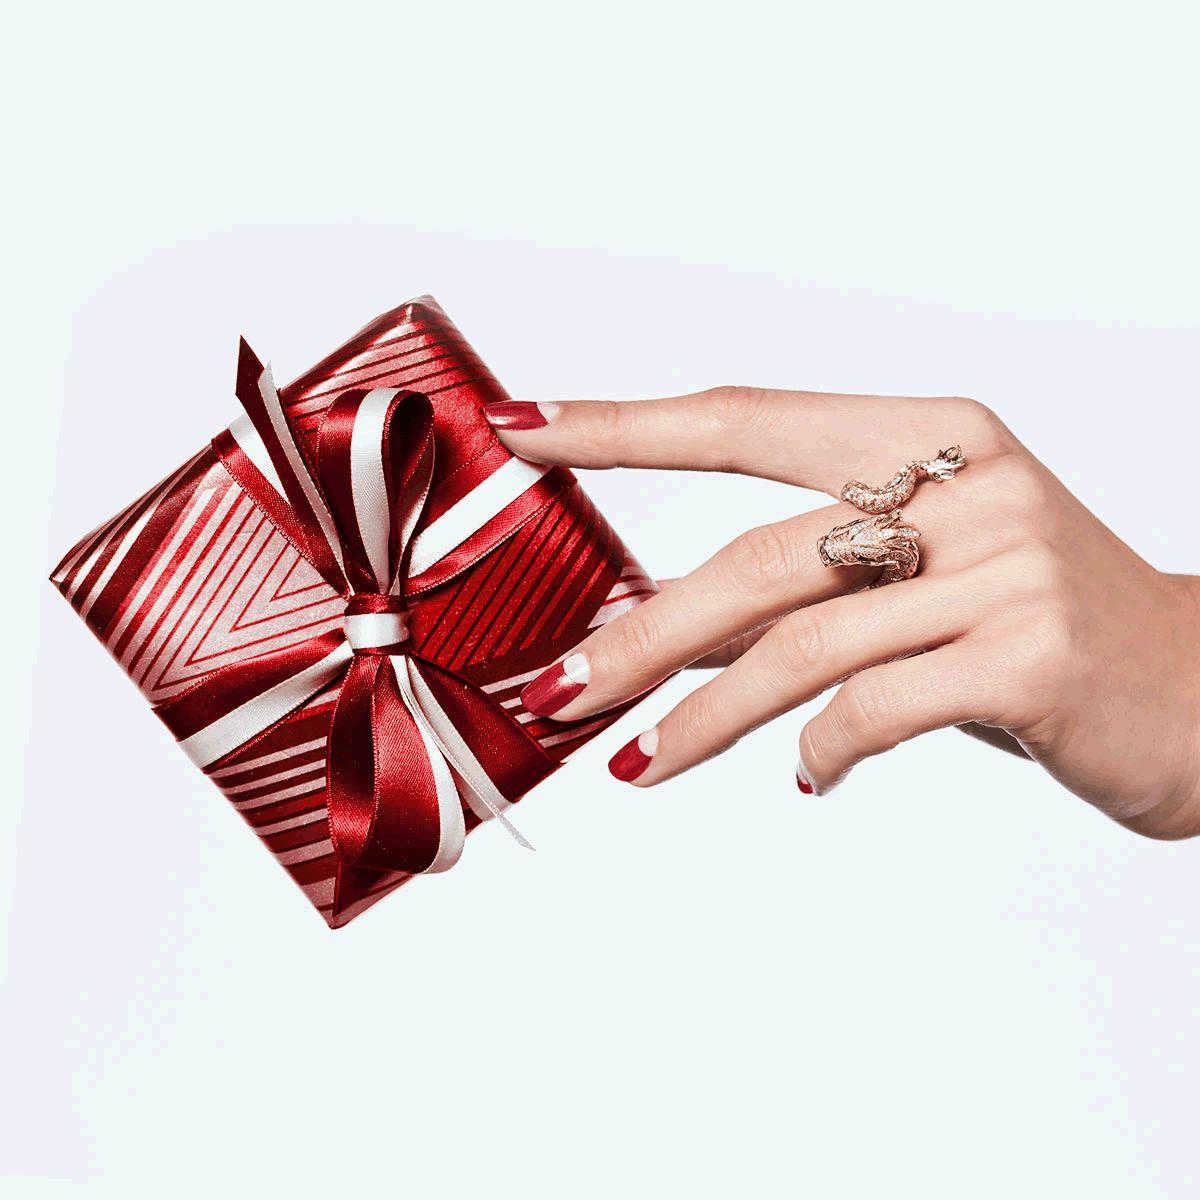 Gifts Under $25, $50, $100